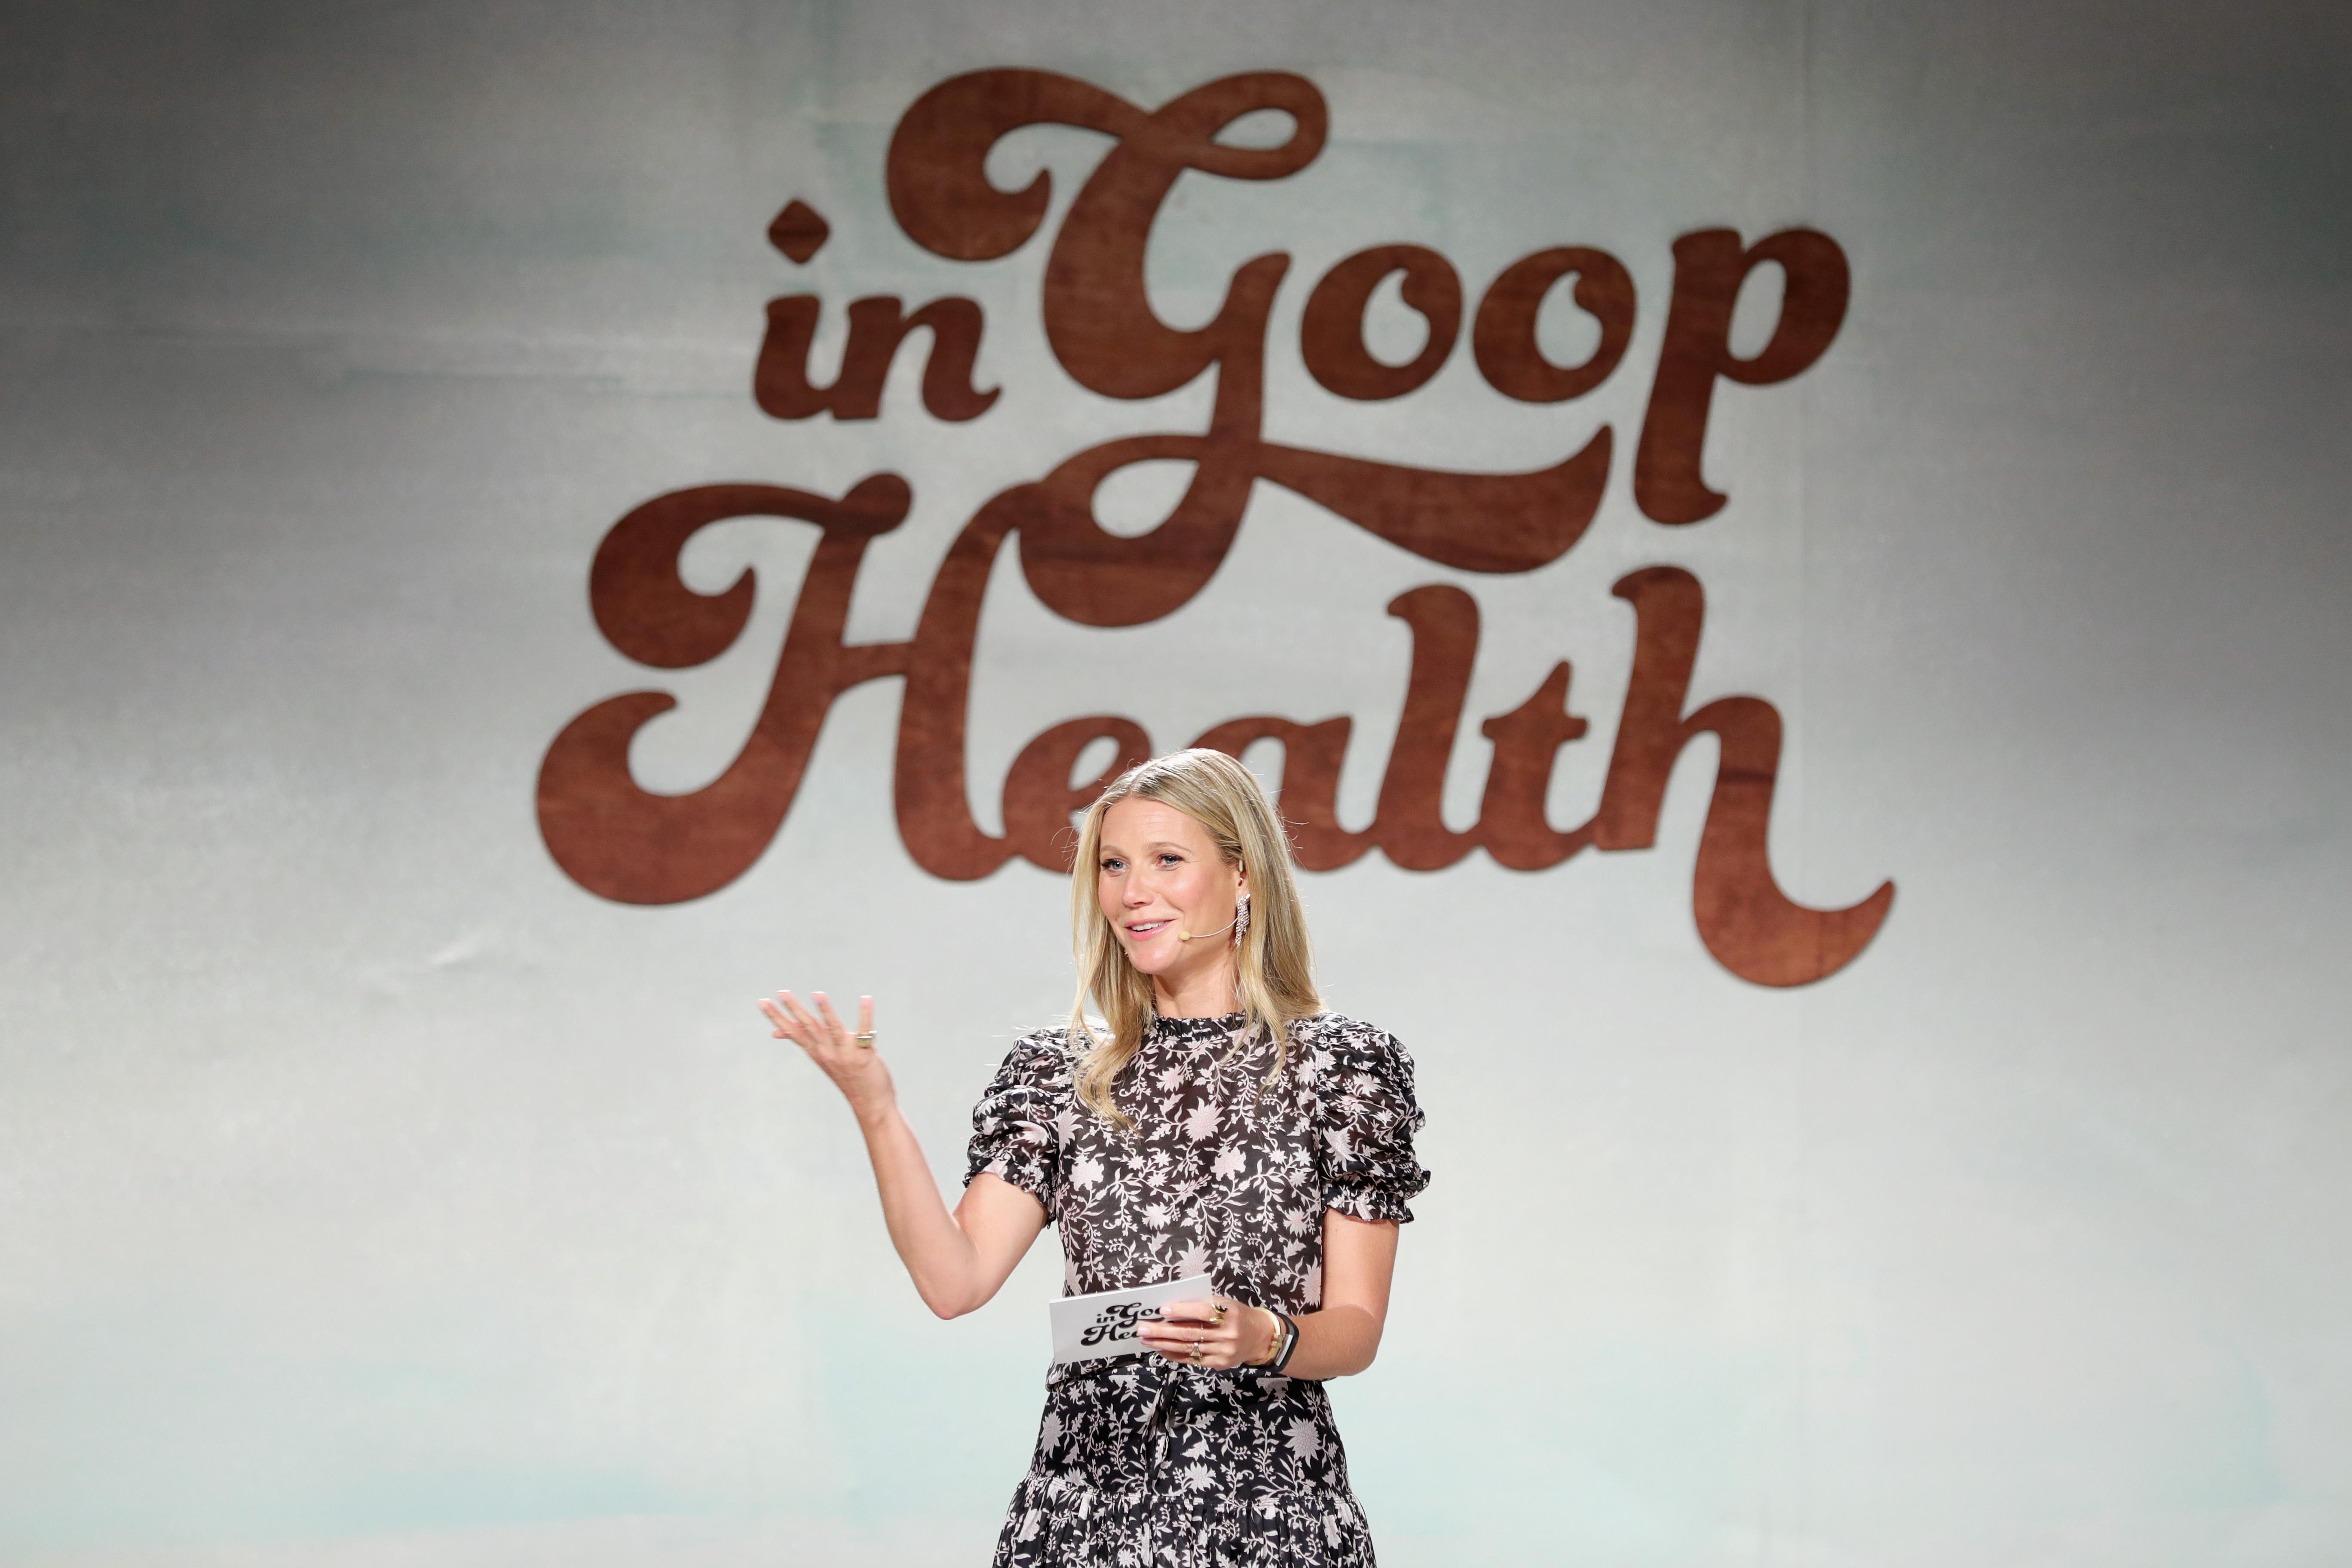 In goop Health Summit